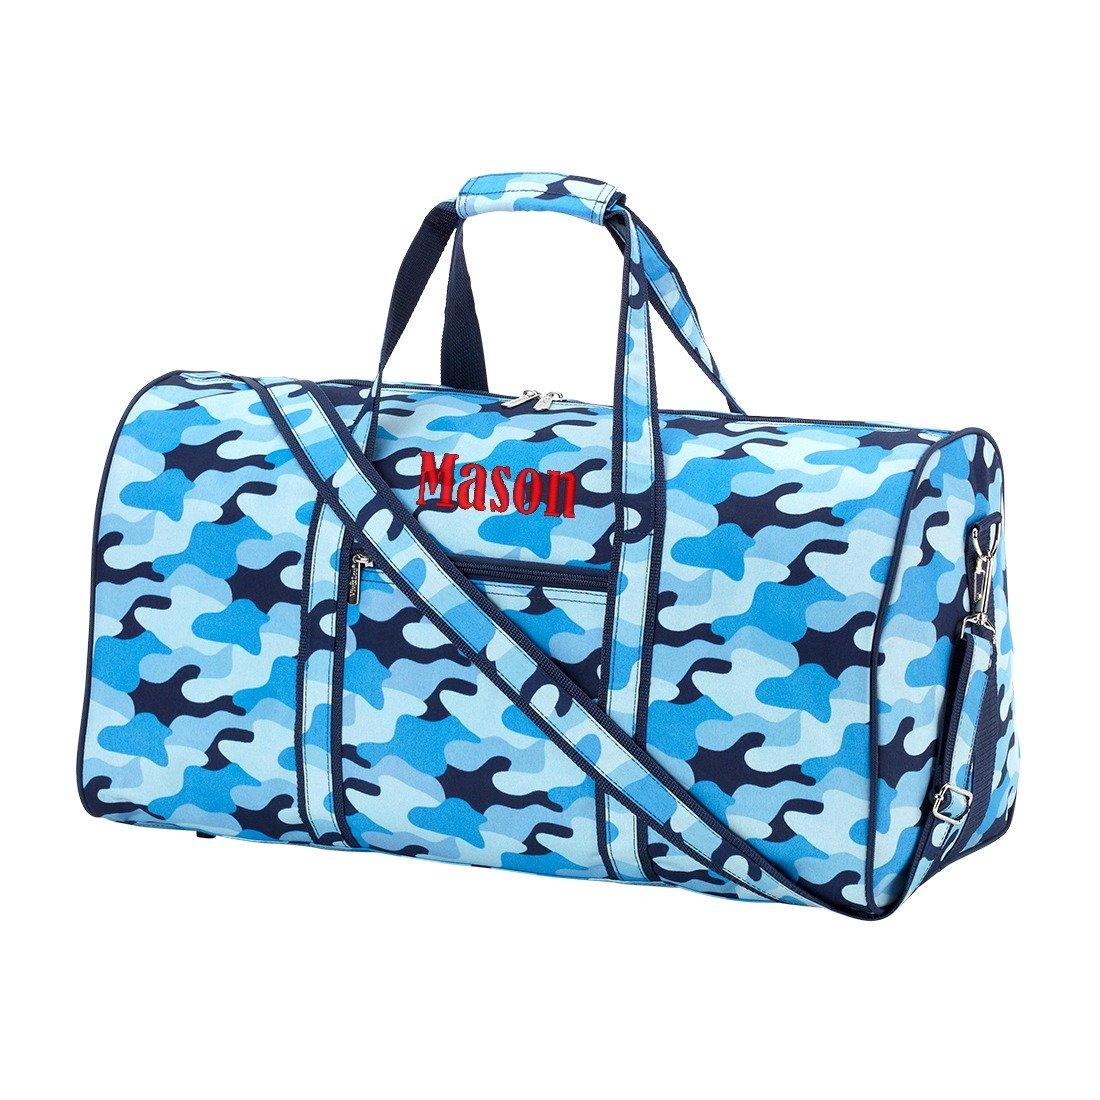 Personalized Large Barrel Duffel Bag Kids Teen Travel Cute girls   boys duffle  bag beautifully monogrammed custom embroidery included! 980e5c841d907